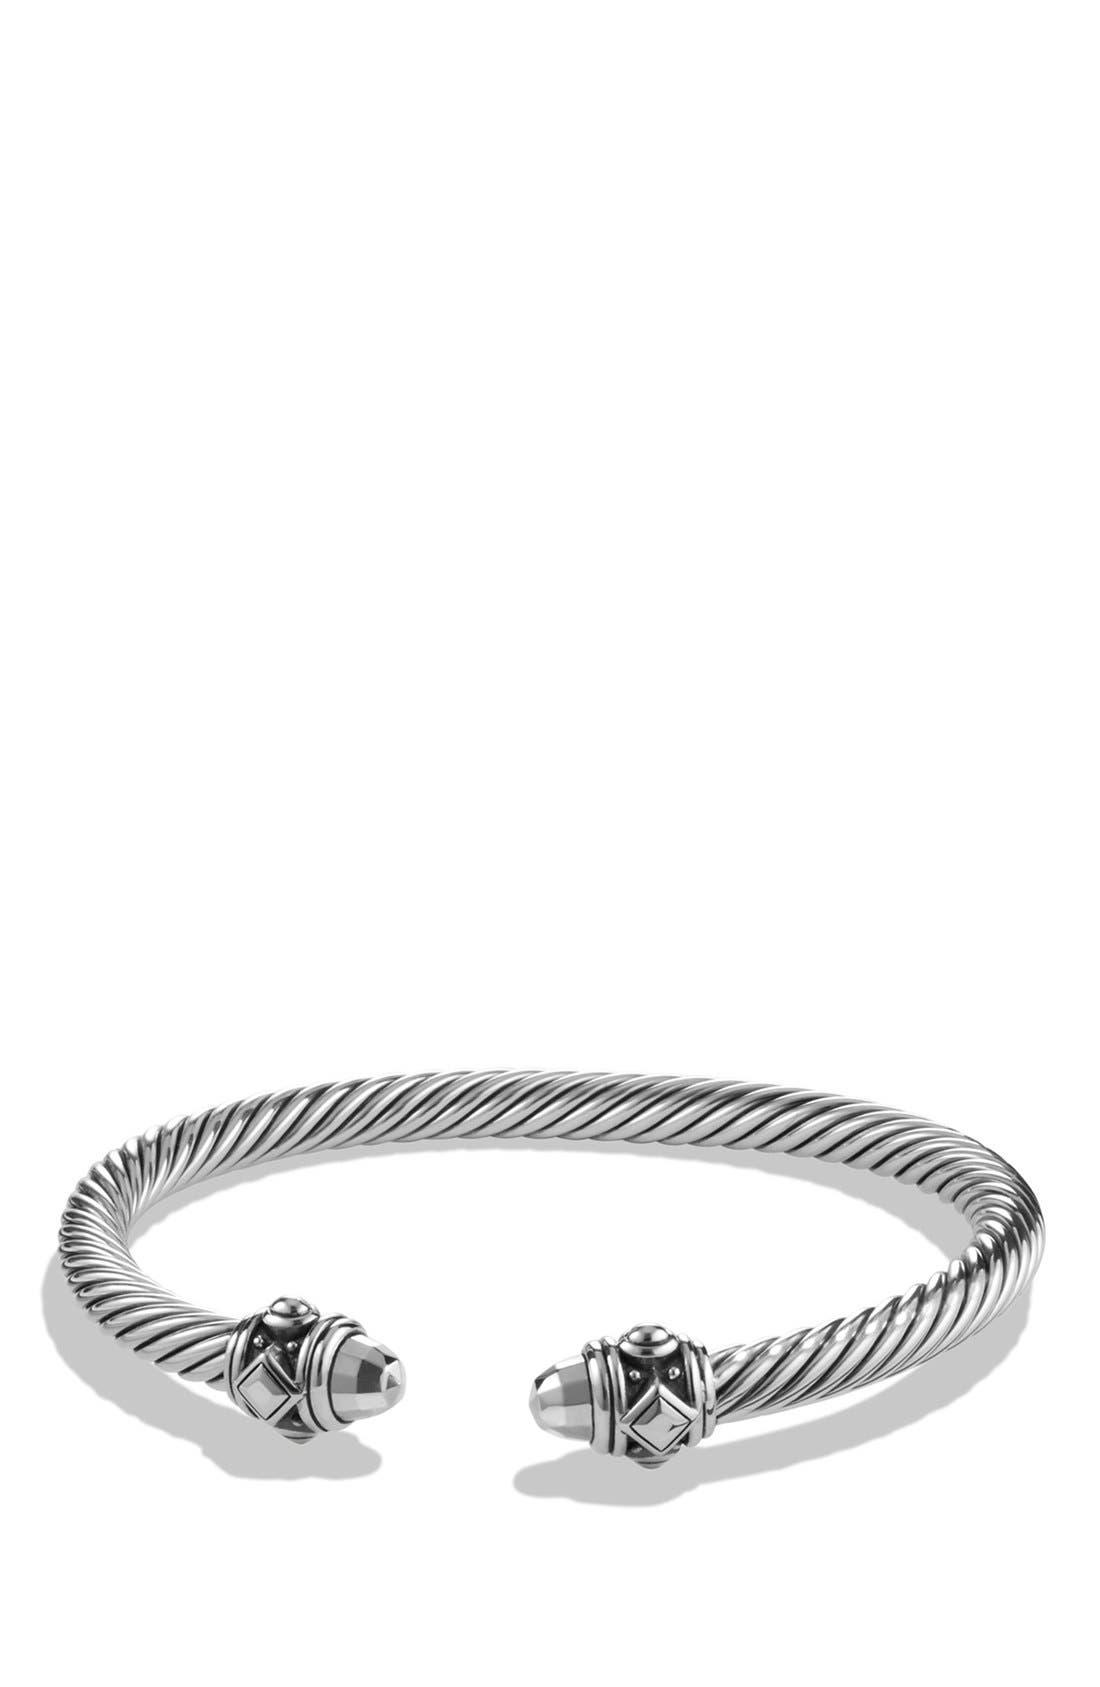 Alternate Image 1 Selected - David Yurman 'Renaissance' Bracelet, 5mm